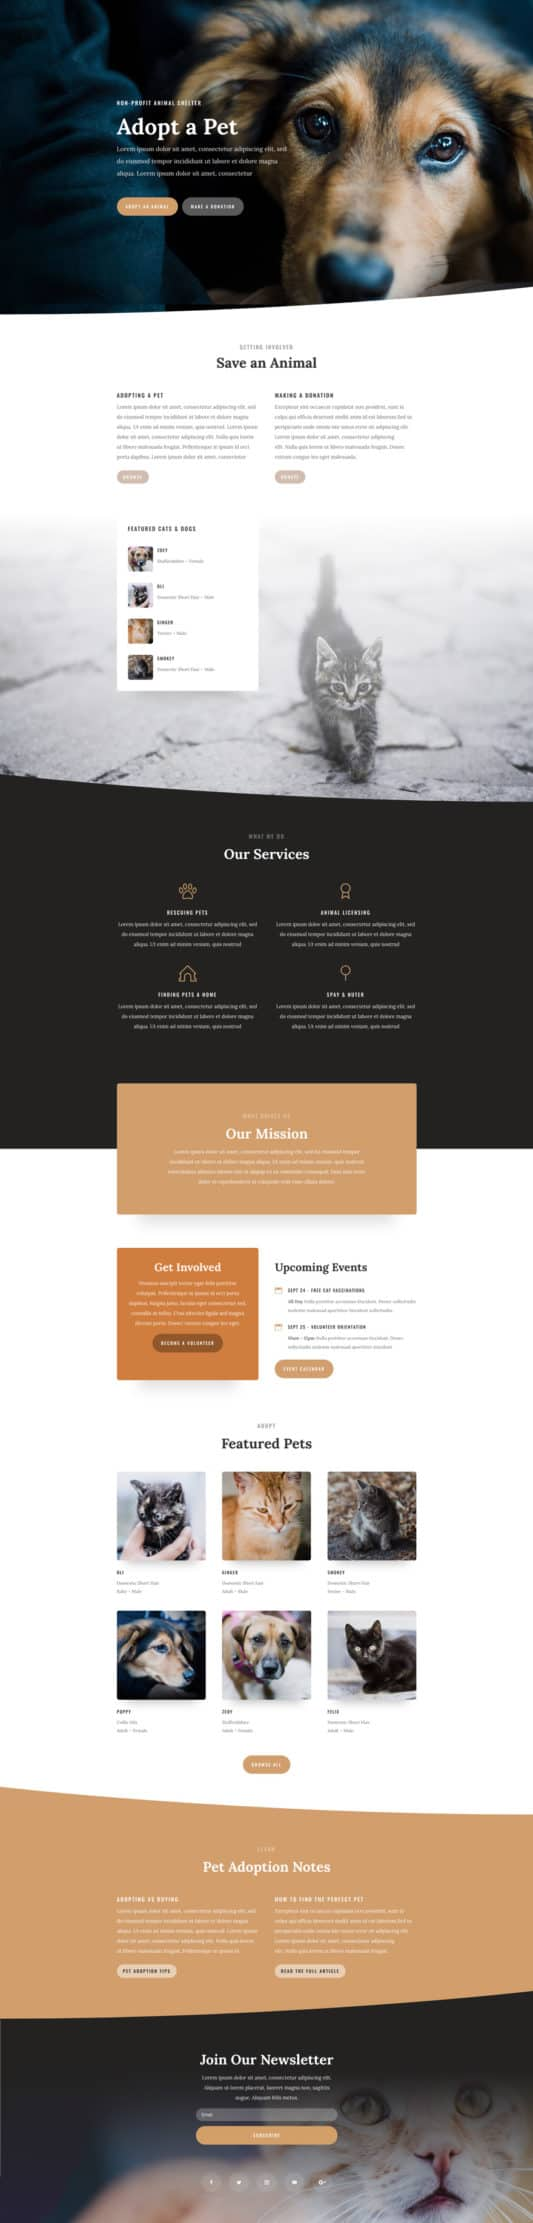 Animal Shelter Web Design 6